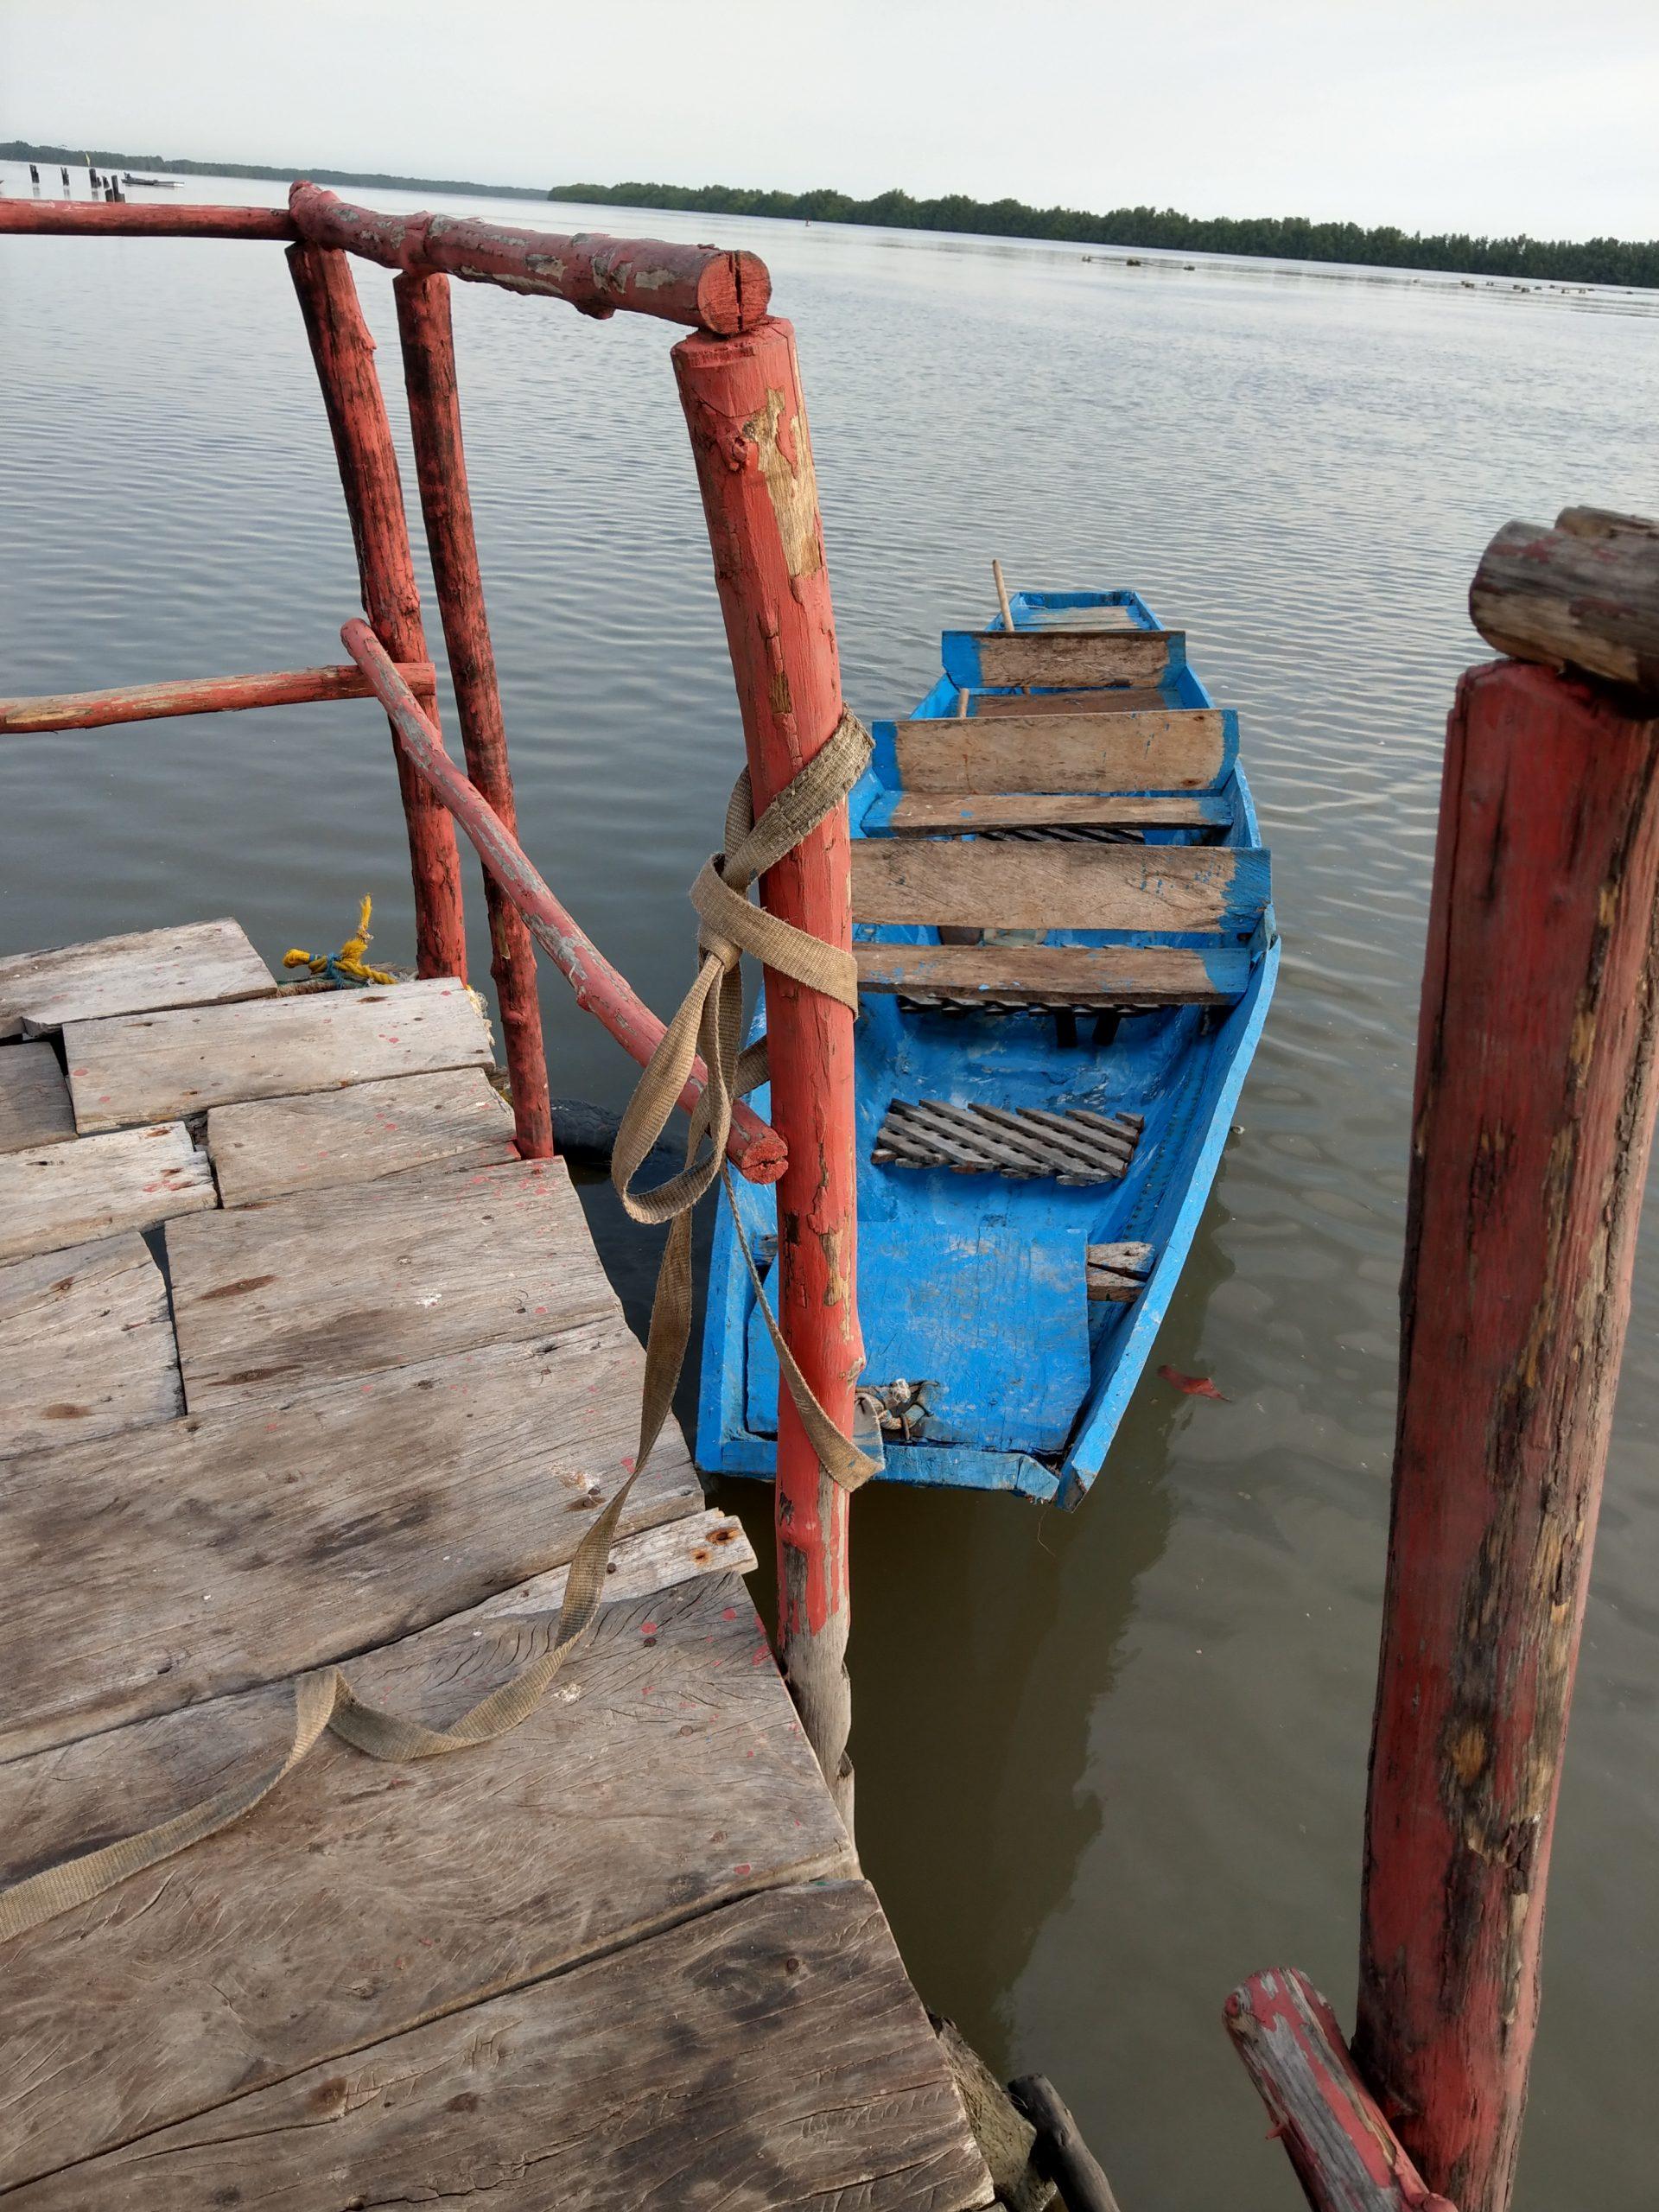 Bintang paddling boat